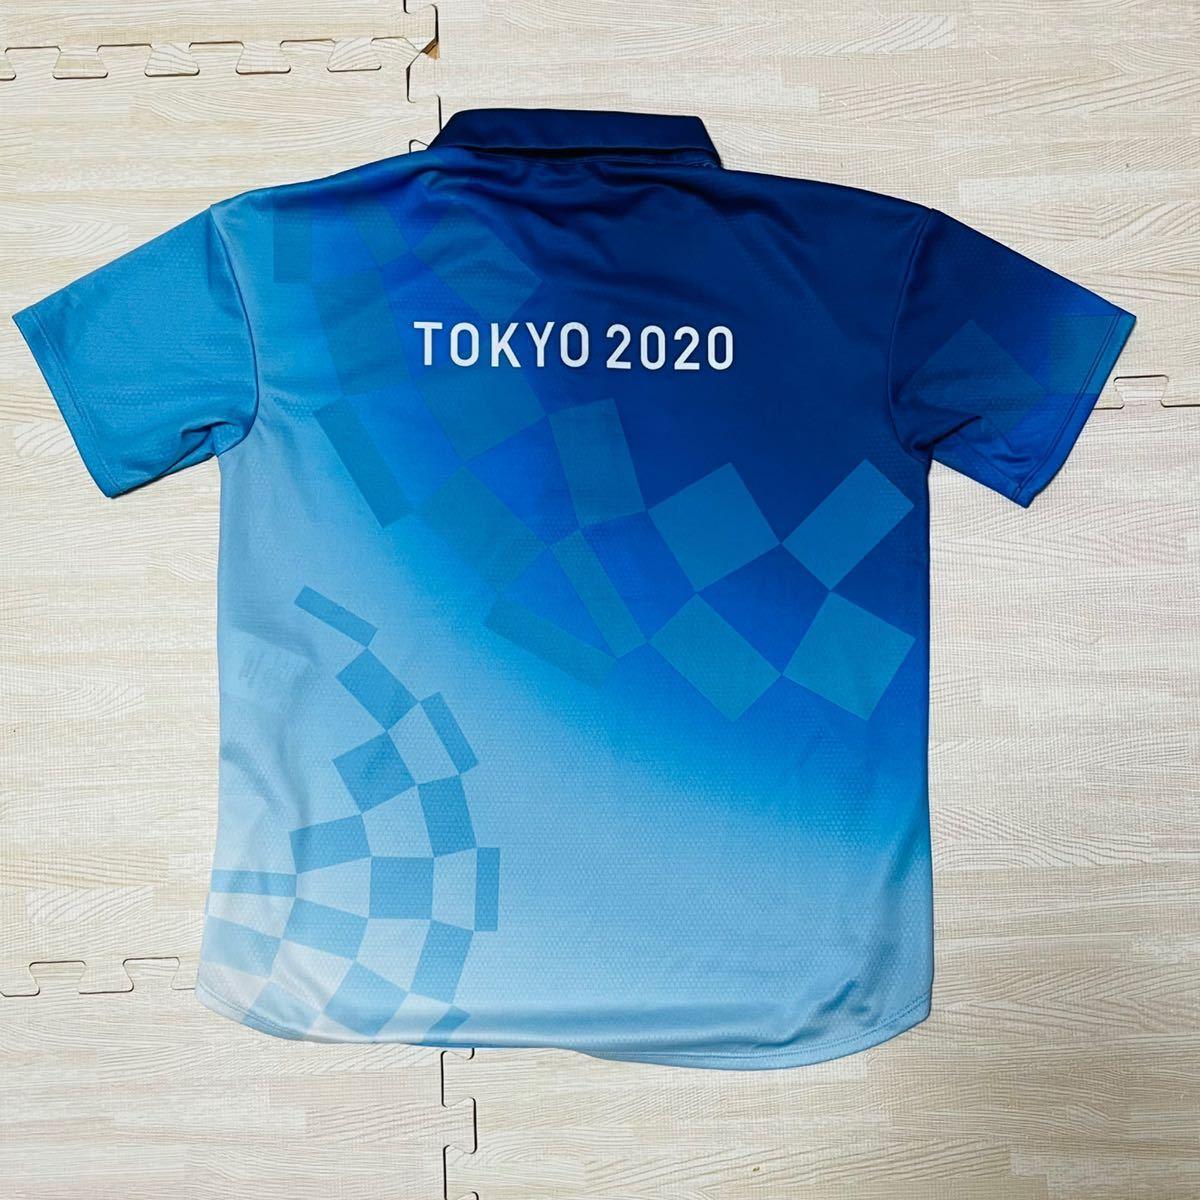 【2XS】東京オリンピック2020 ポロシャツ 未使用_画像2